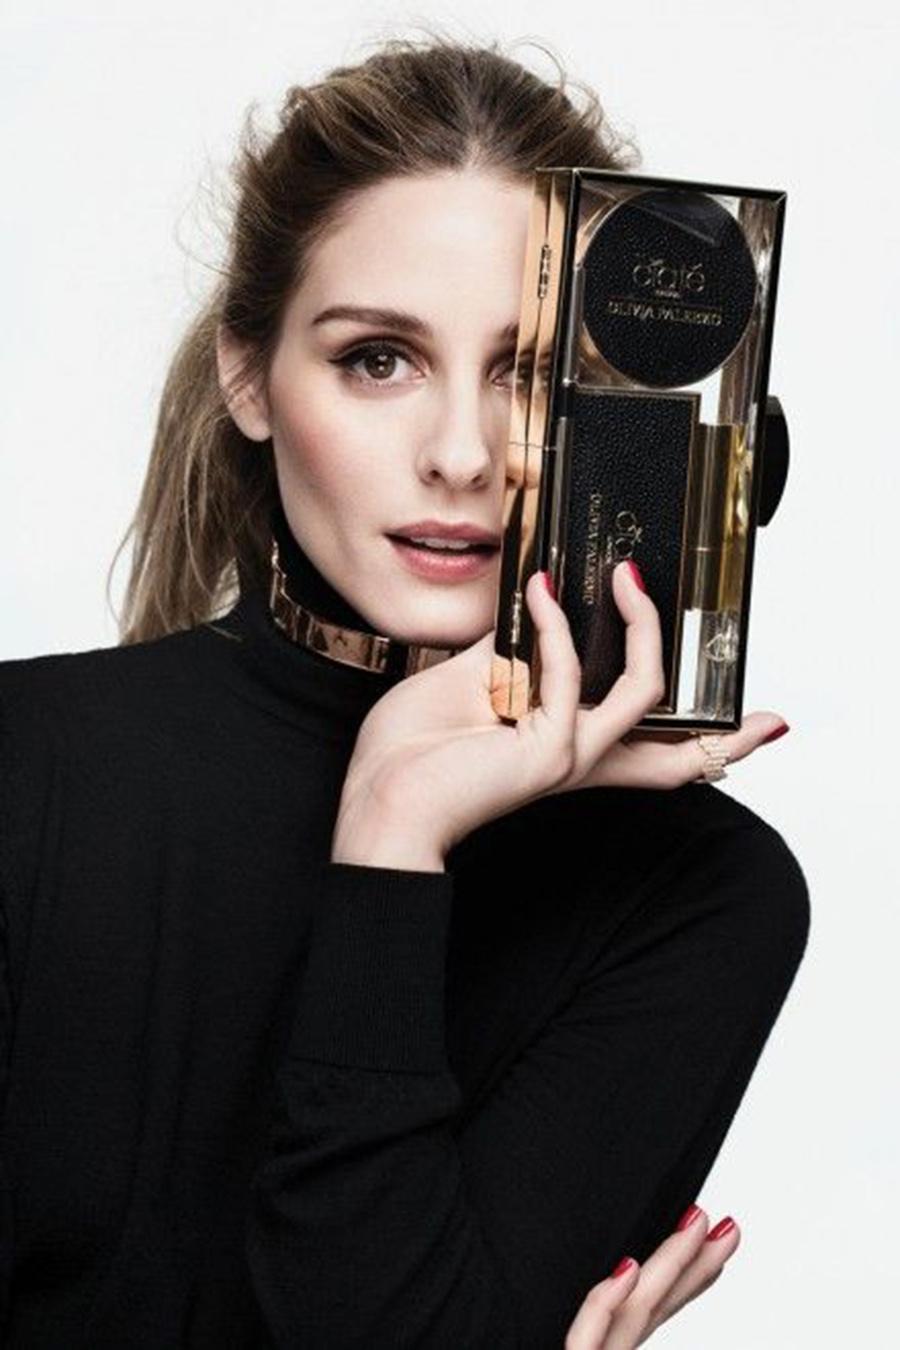 Olivia Palermo, Ciate, Make-Up, Beauty Products, Celebrity Collaboration, Nail Polish, Olivia Palermo X Ciate